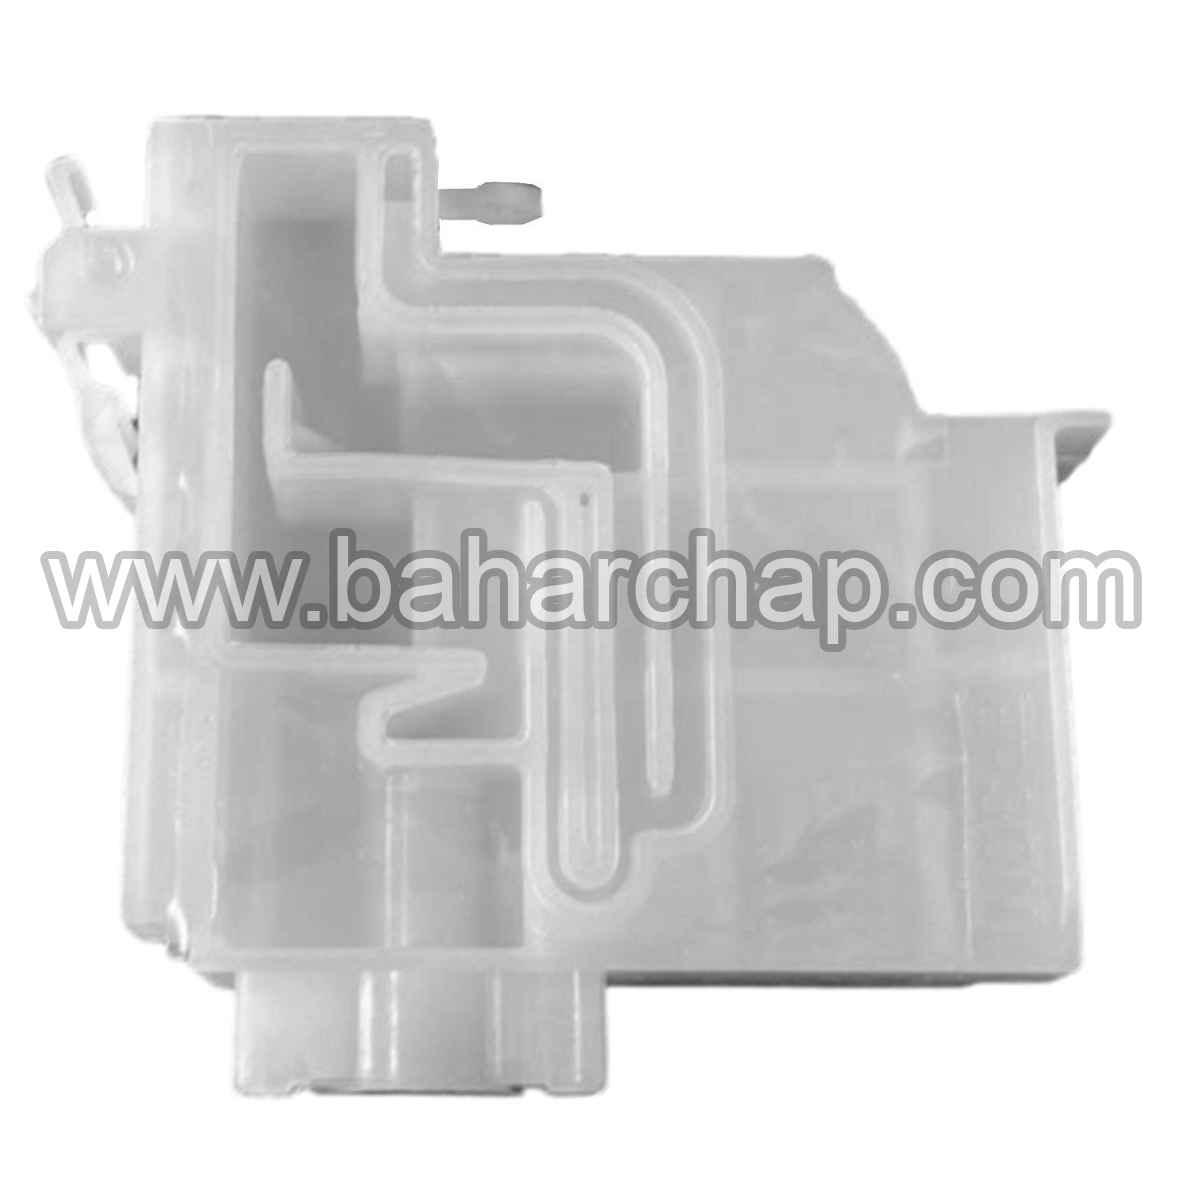 فروشگاه و خدمات اینترنتی بهارچاپ اصفهان-دمپر (کارتریج جوهر)پرینترهای اپسون سری L-Original-Epson-Ink-Damper-Adapter-Assy-L1110-L3110-L3116-L3150-L3156-L5190